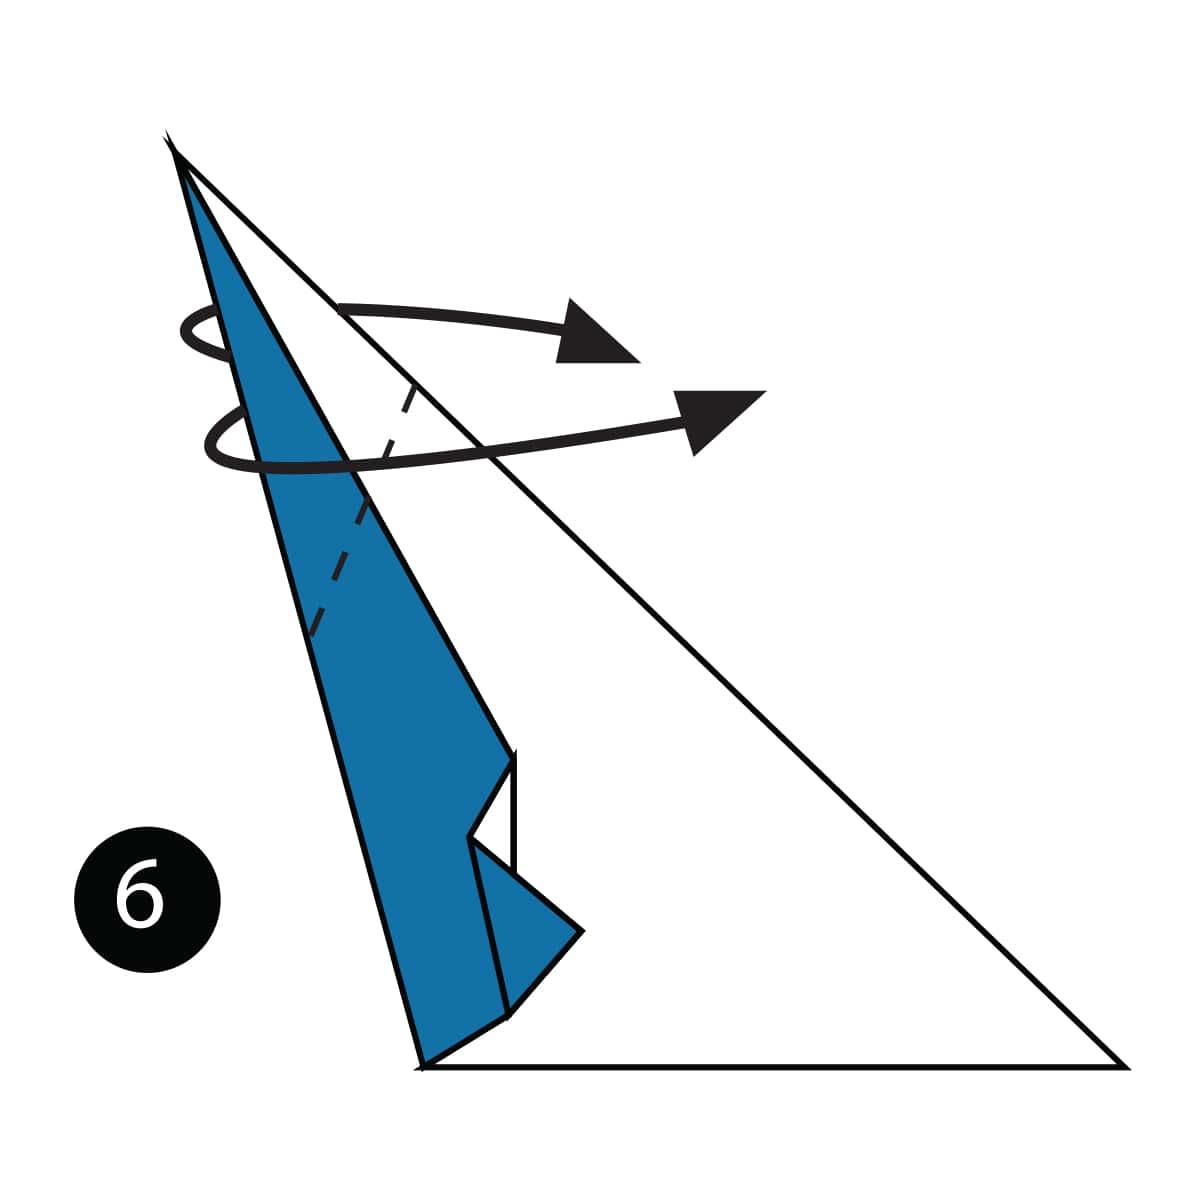 Penguin Step 6